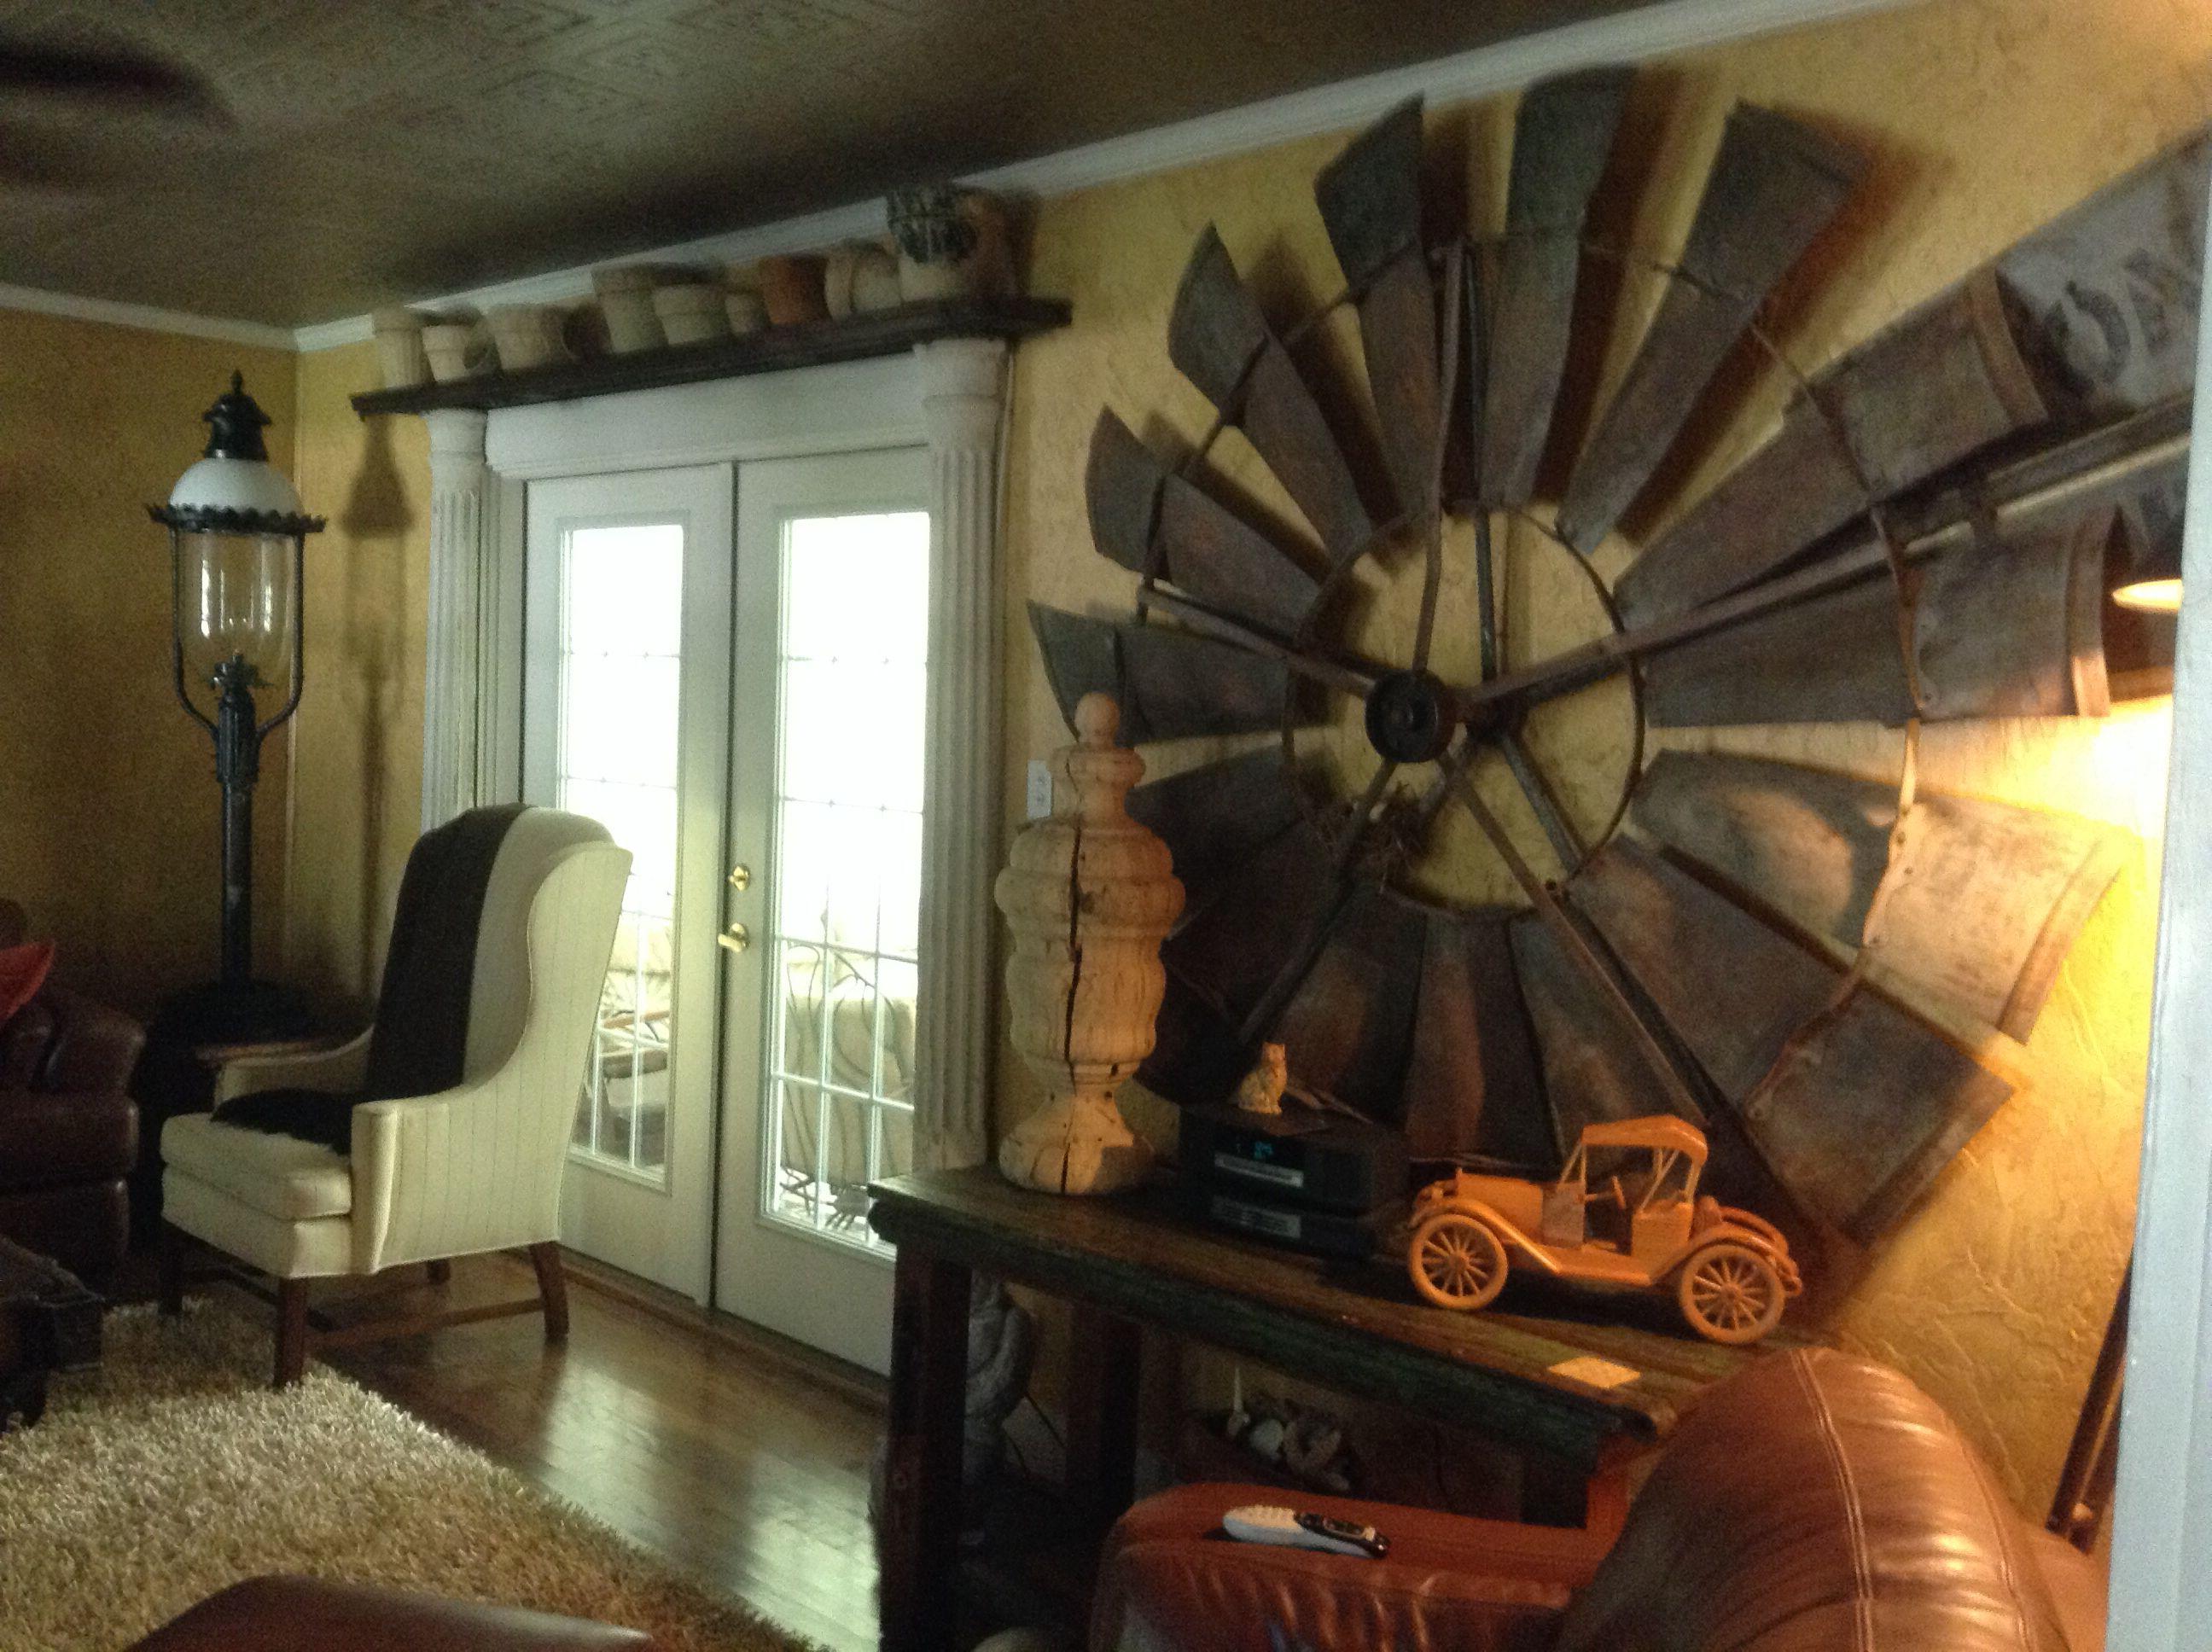 Windmill fan wall decor. Hinz57 on Facebook